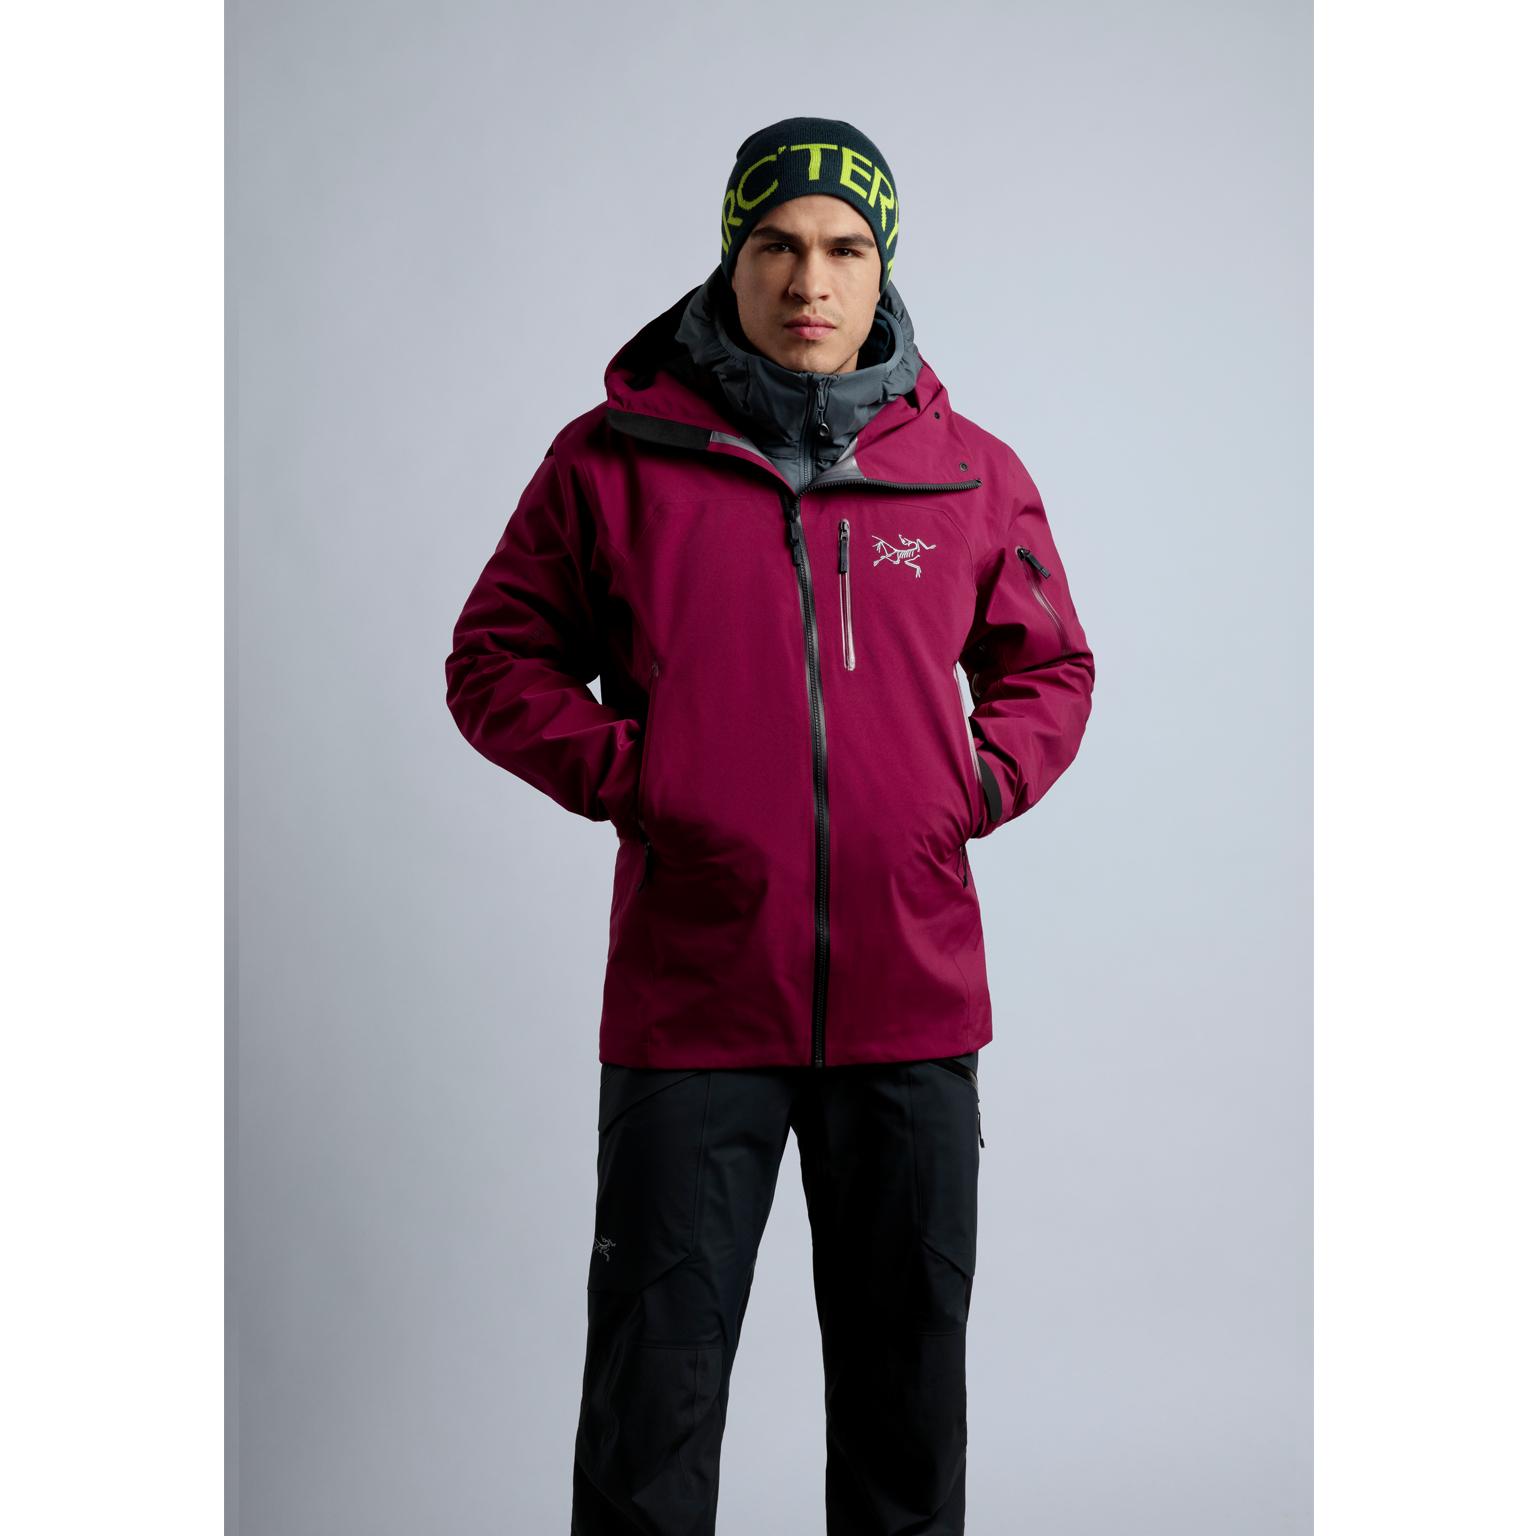 Toronto-Fitness-Model-Agency-Winter-Acrteryx-Commercial-Juan-Osorio